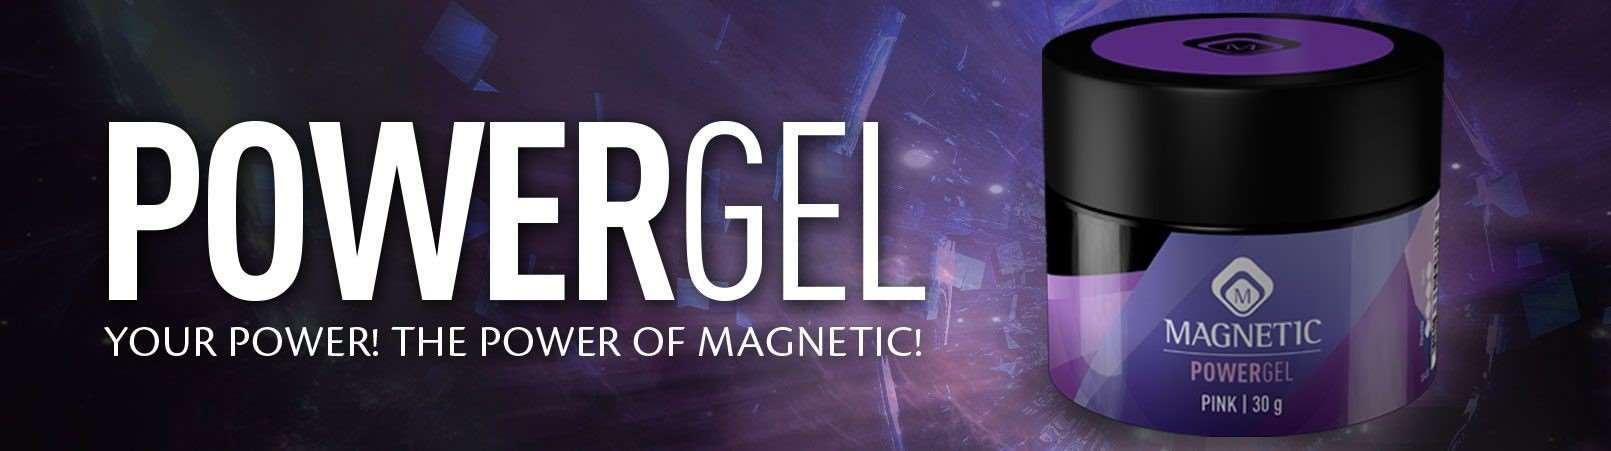 Powergel van Magnetic nu bij Kat's Nails Gorinchem - Nagelstudio Gorinchem Kat's Nails